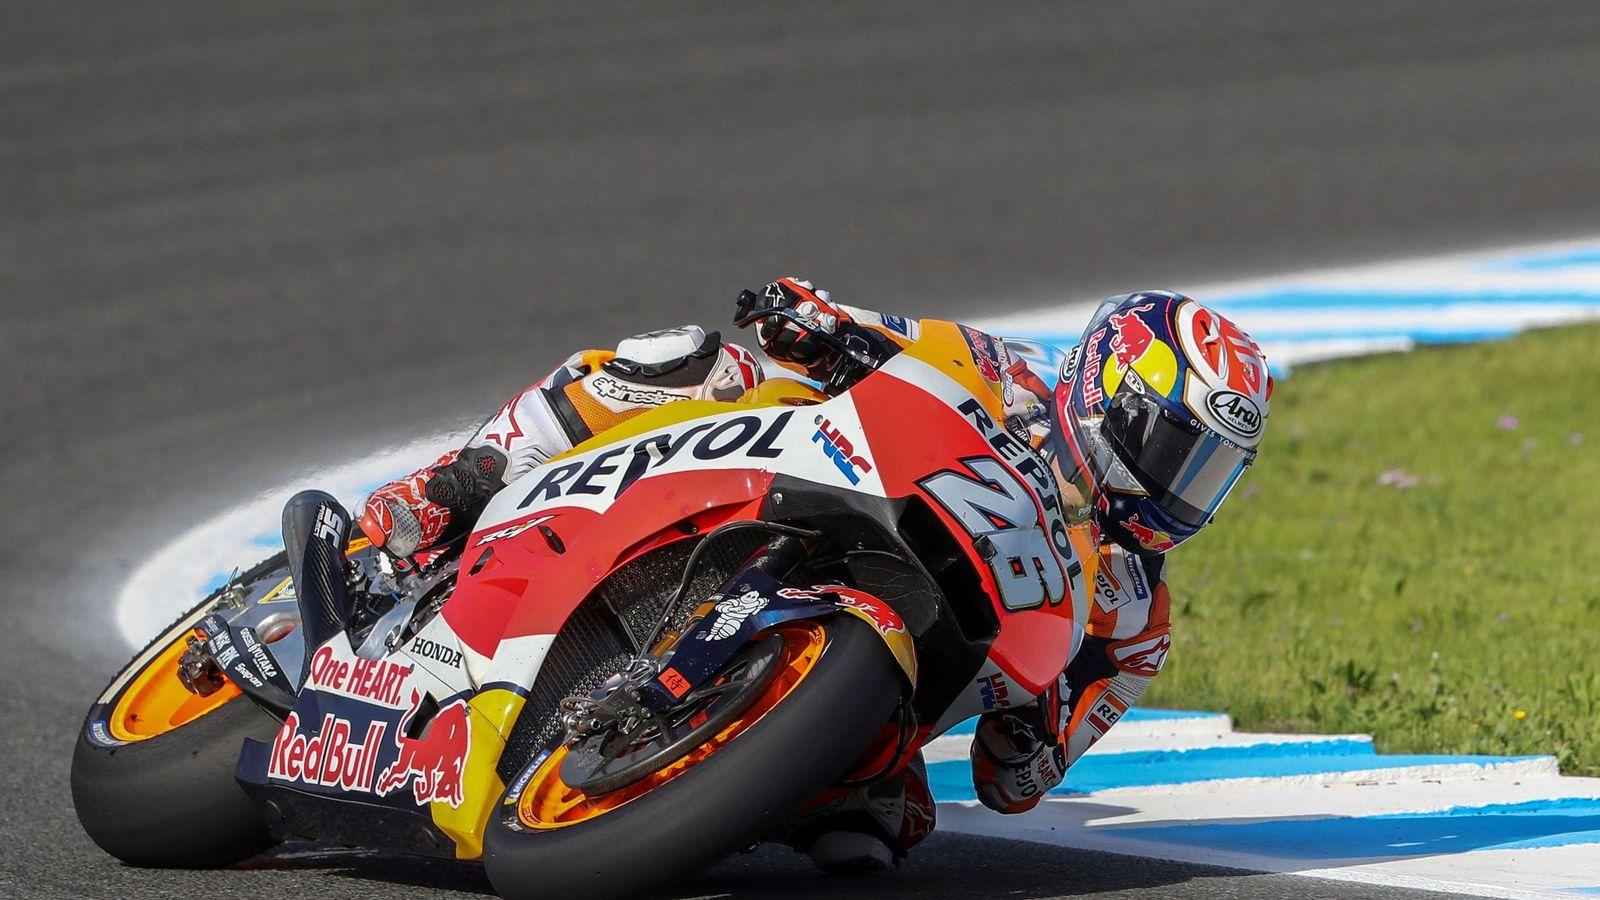 Foto: Dani Pedrosa es piloto del equipo oficial de Honda desde 2006. (EFE)